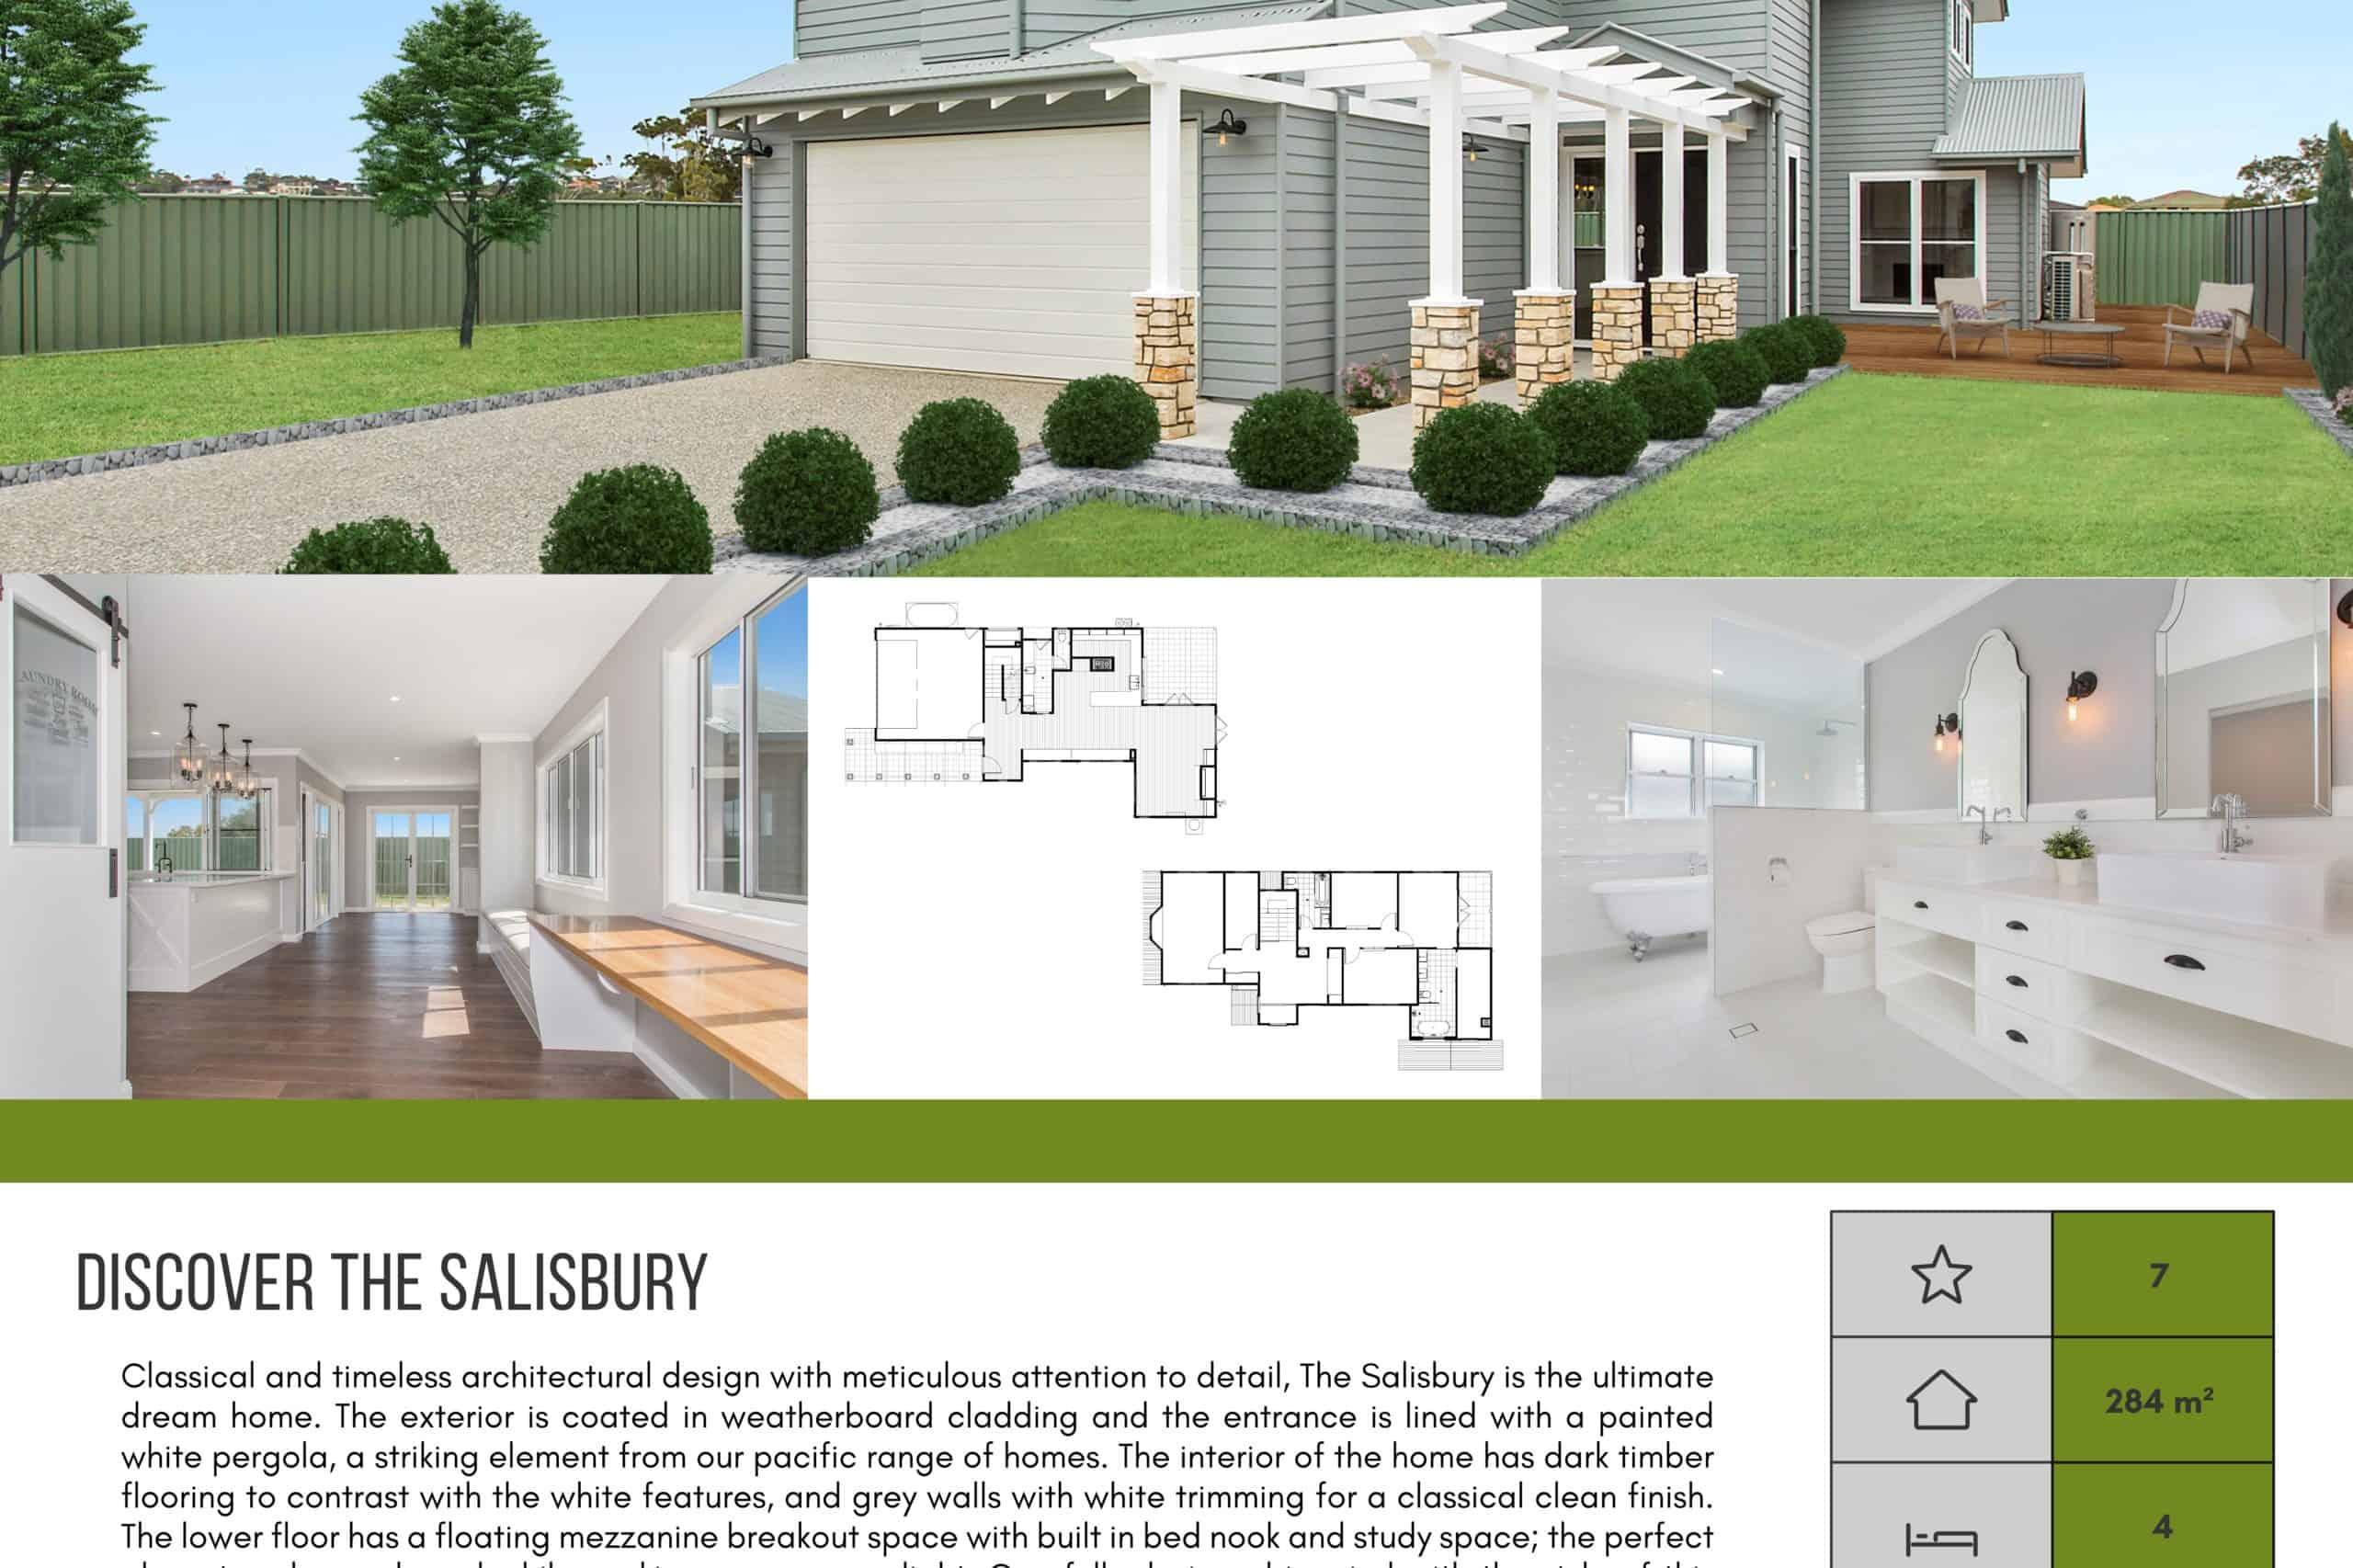 The Salisbury Download Brochure Thank You